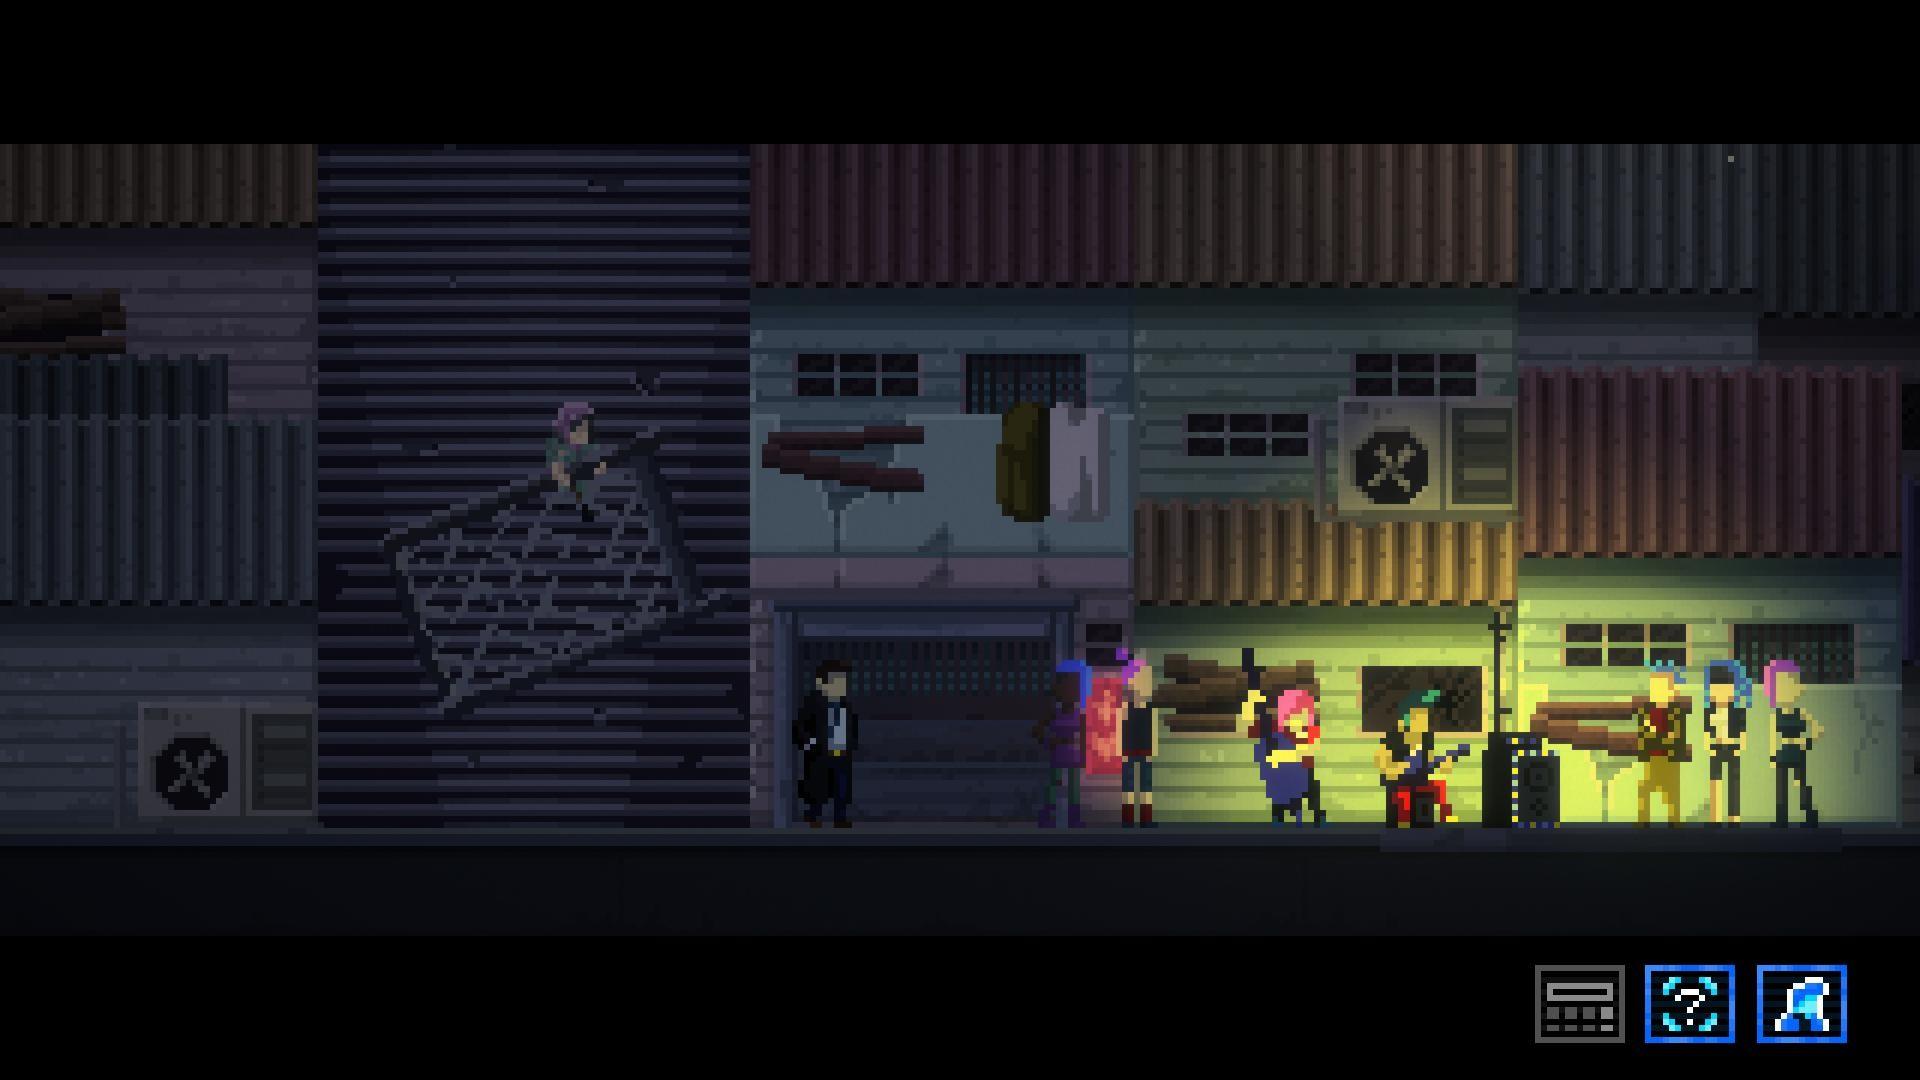 Lacuna A Sci-Fi Noir Adventure Free Download